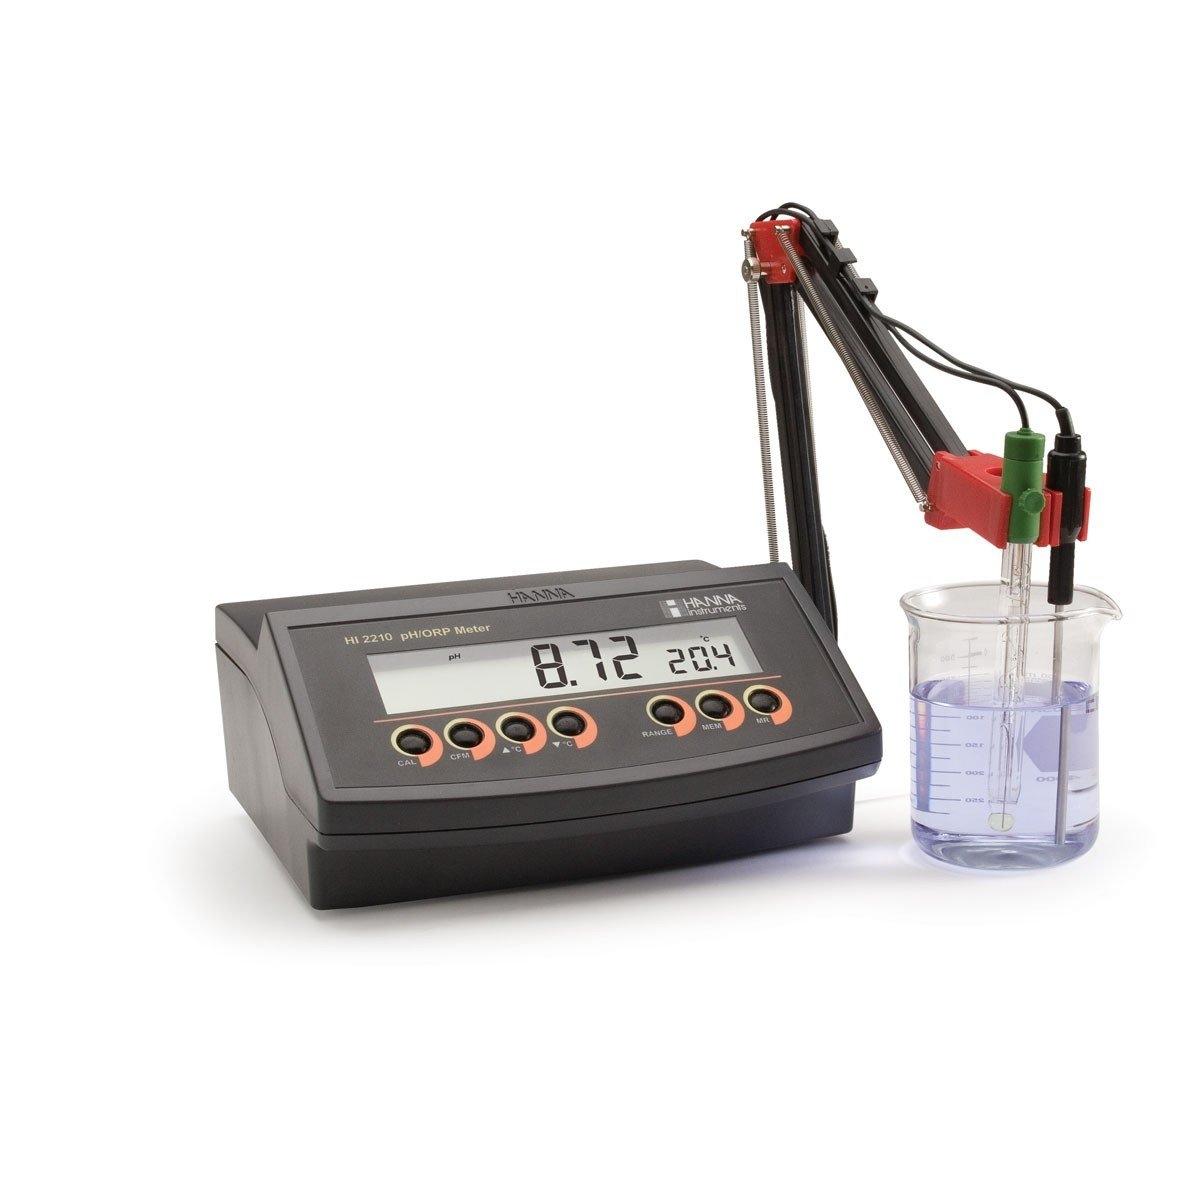 Benchtop pH Meter with 0.01 pH Resolution HI2210-01 pH Water / Liquid Analysis Malaysia, Selangor, Kuala Lumpur (KL) Supplier, Suppliers, Supply, Supplies | Obsnap Instruments Sdn Bhd